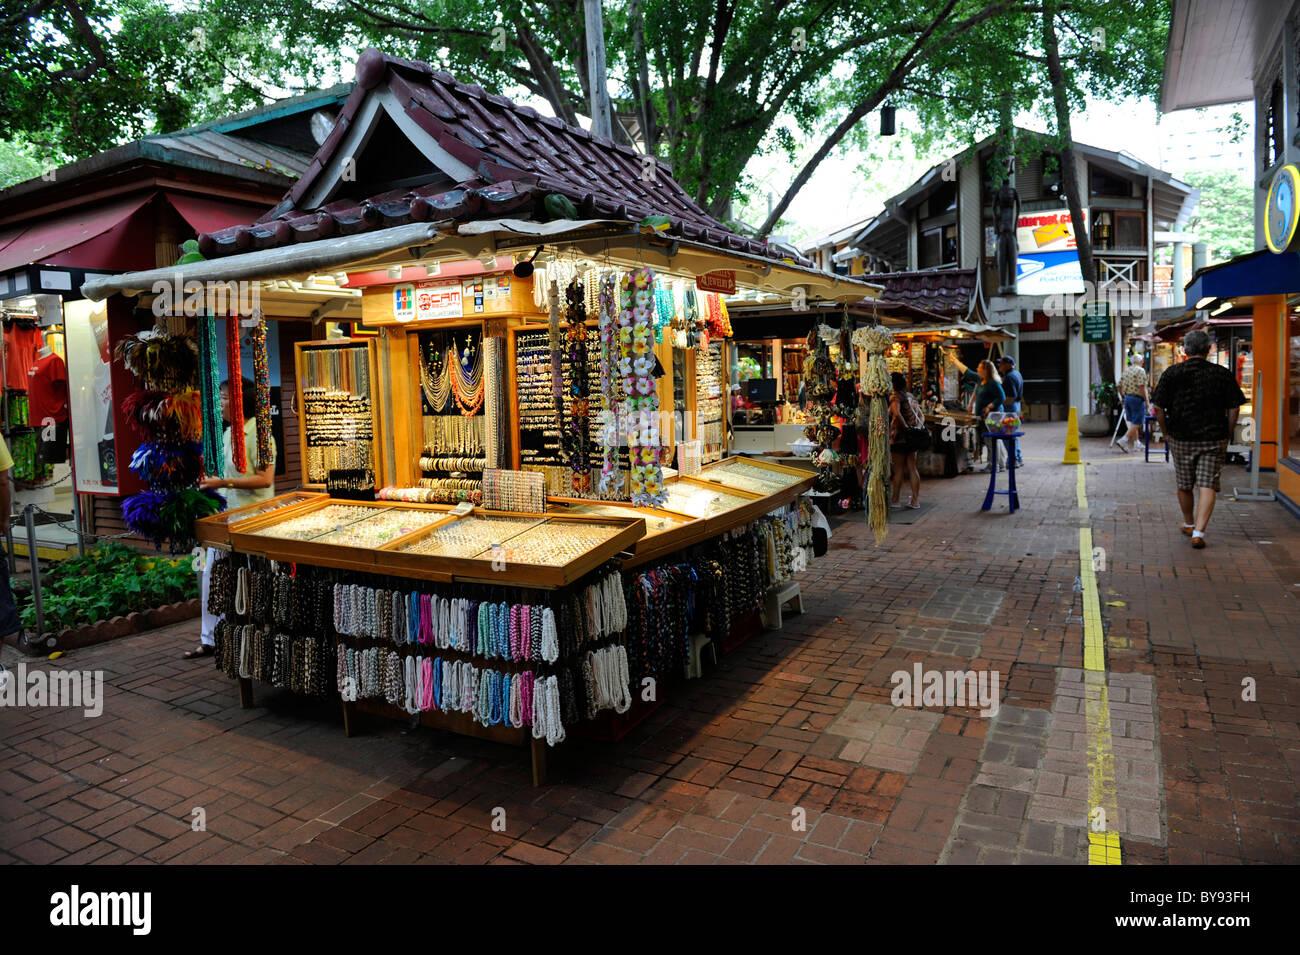 21d4962c35a International Market Place on Kalakaua Ave along Waikiki Beach Honolulu  Hawaii